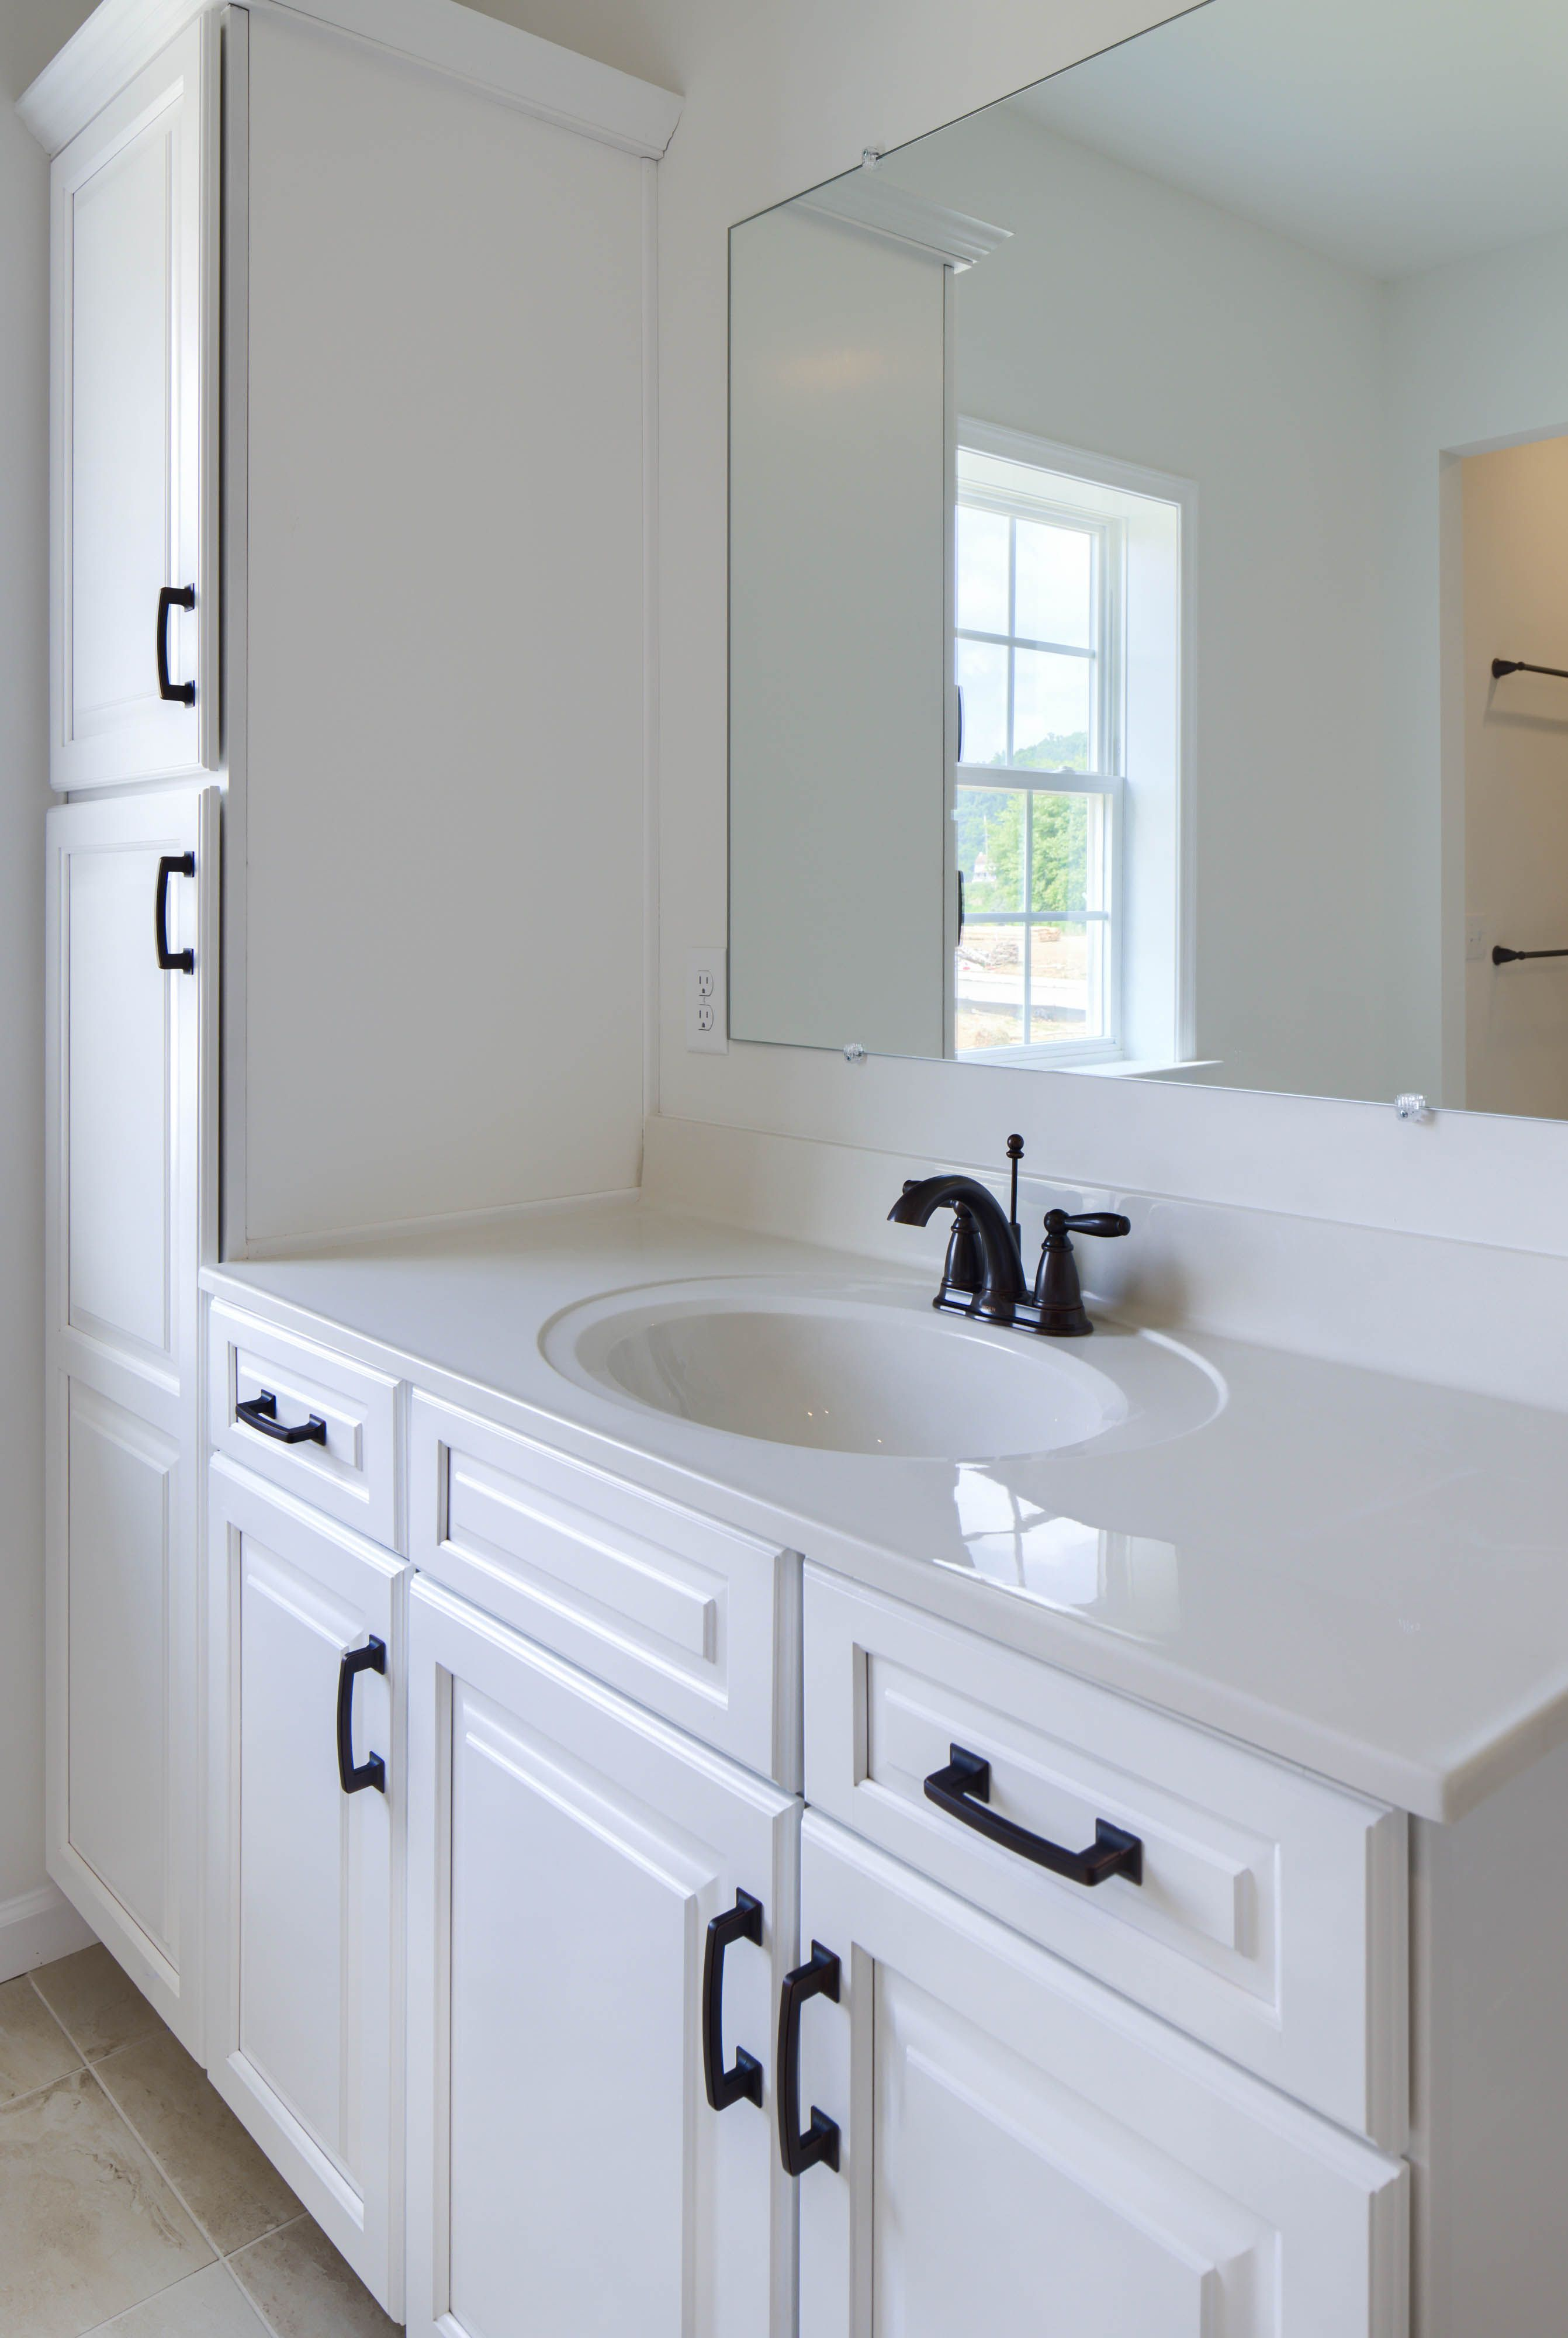 Bathroom featured in the Nottingham Farmhouse By Keystone Custom Homes in Harrisburg, PA